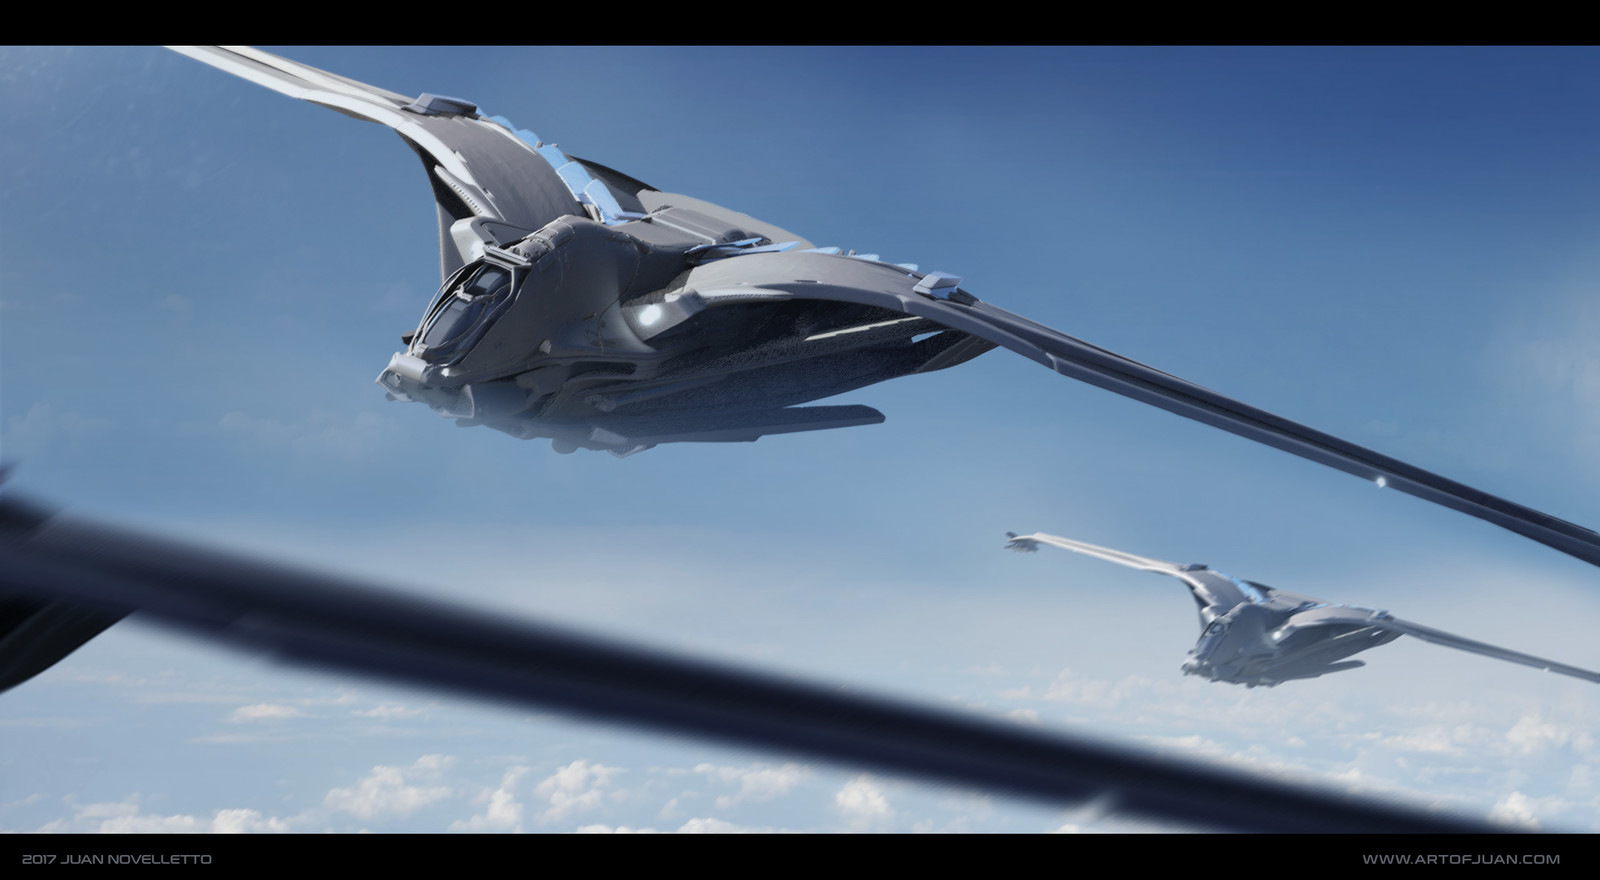 Plane kitbash